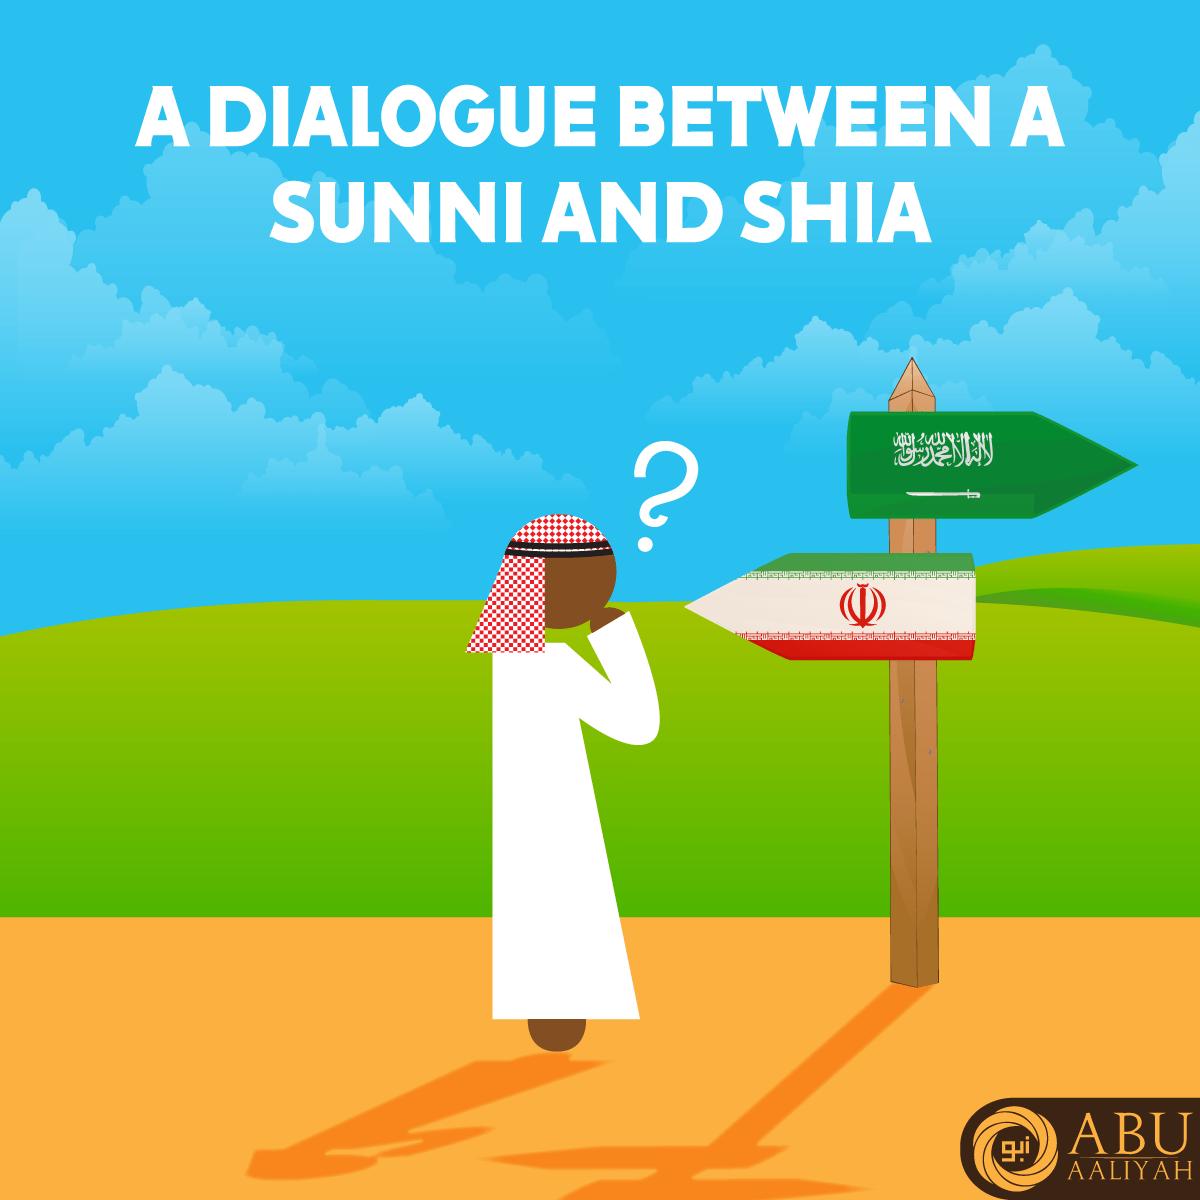 Sunni Shia Map